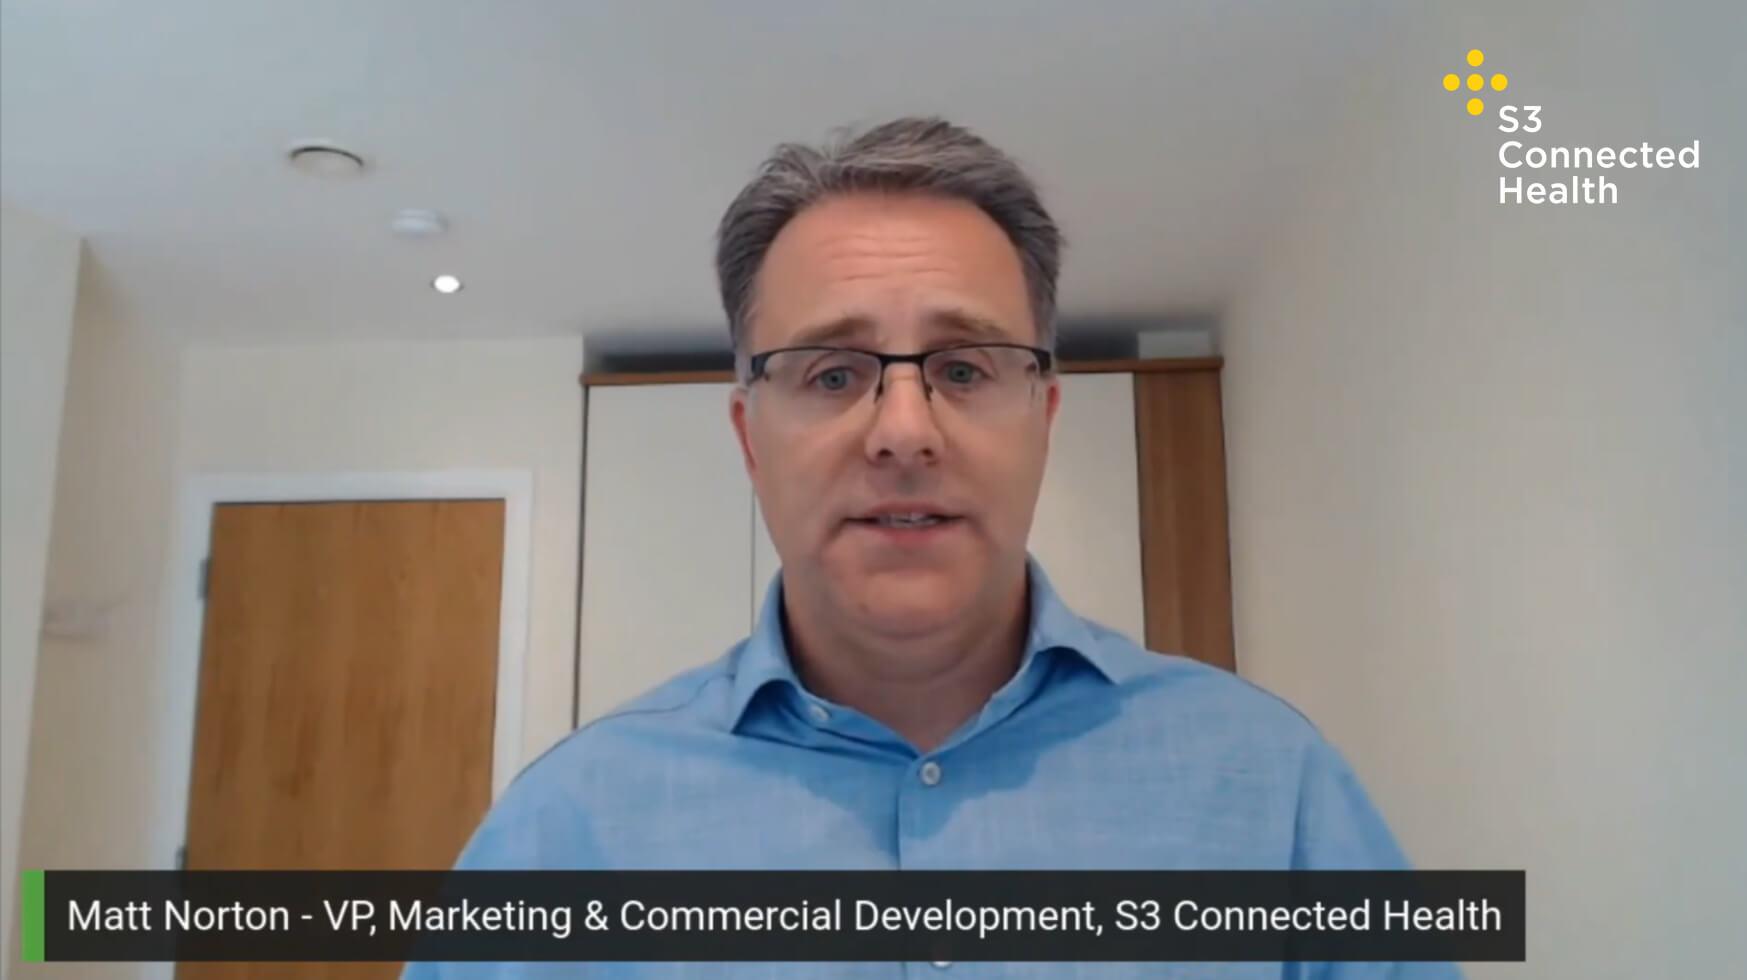 Matt Norton - Co-Creating, Partnering, and Licensing DTx